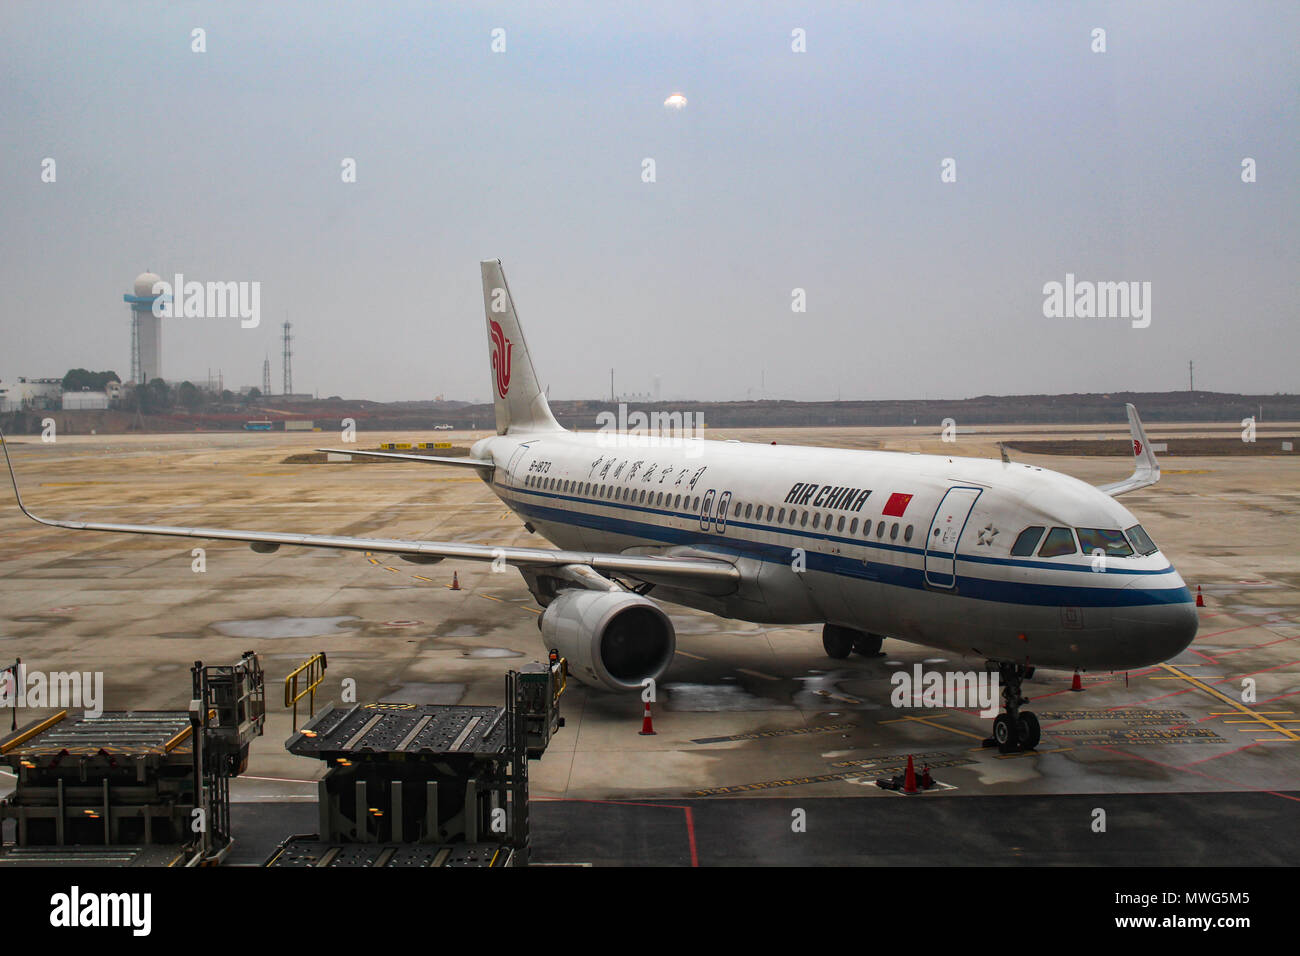 Wuhan, China - March 14, 2018: Air China Airbus A320 Neo aircraft parked at Wuhan airport Stock Photo